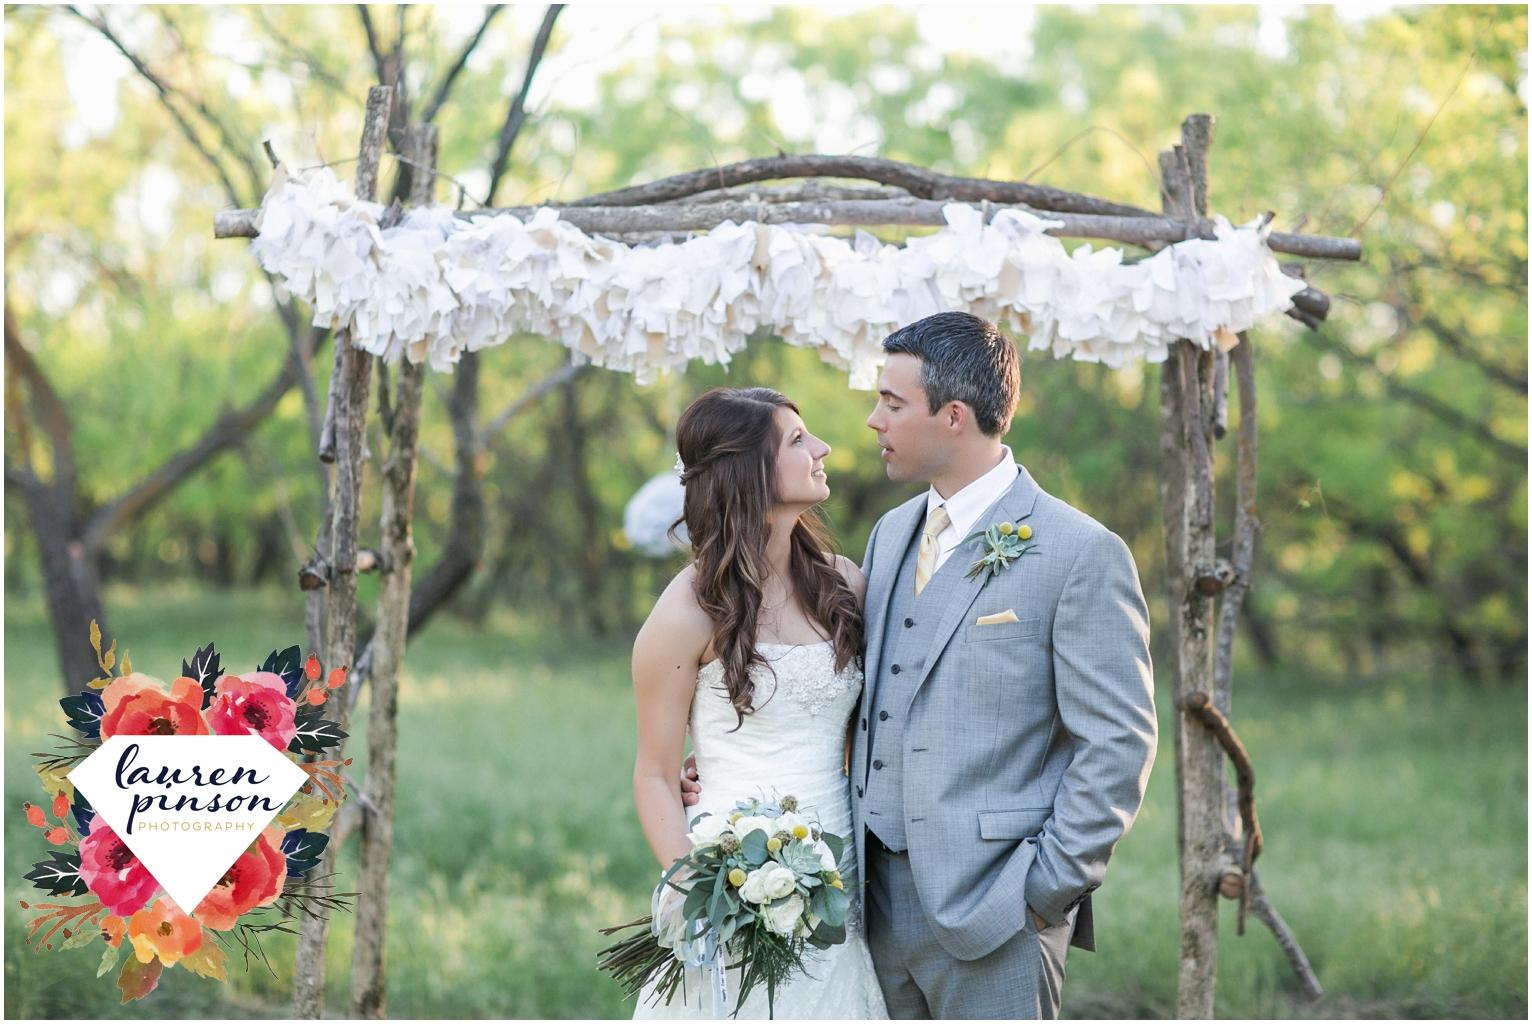 wichita-falls-wedding-photographer-oklahoma-wichita-mountains-bridal-session-bridals-photography_0757.jpg